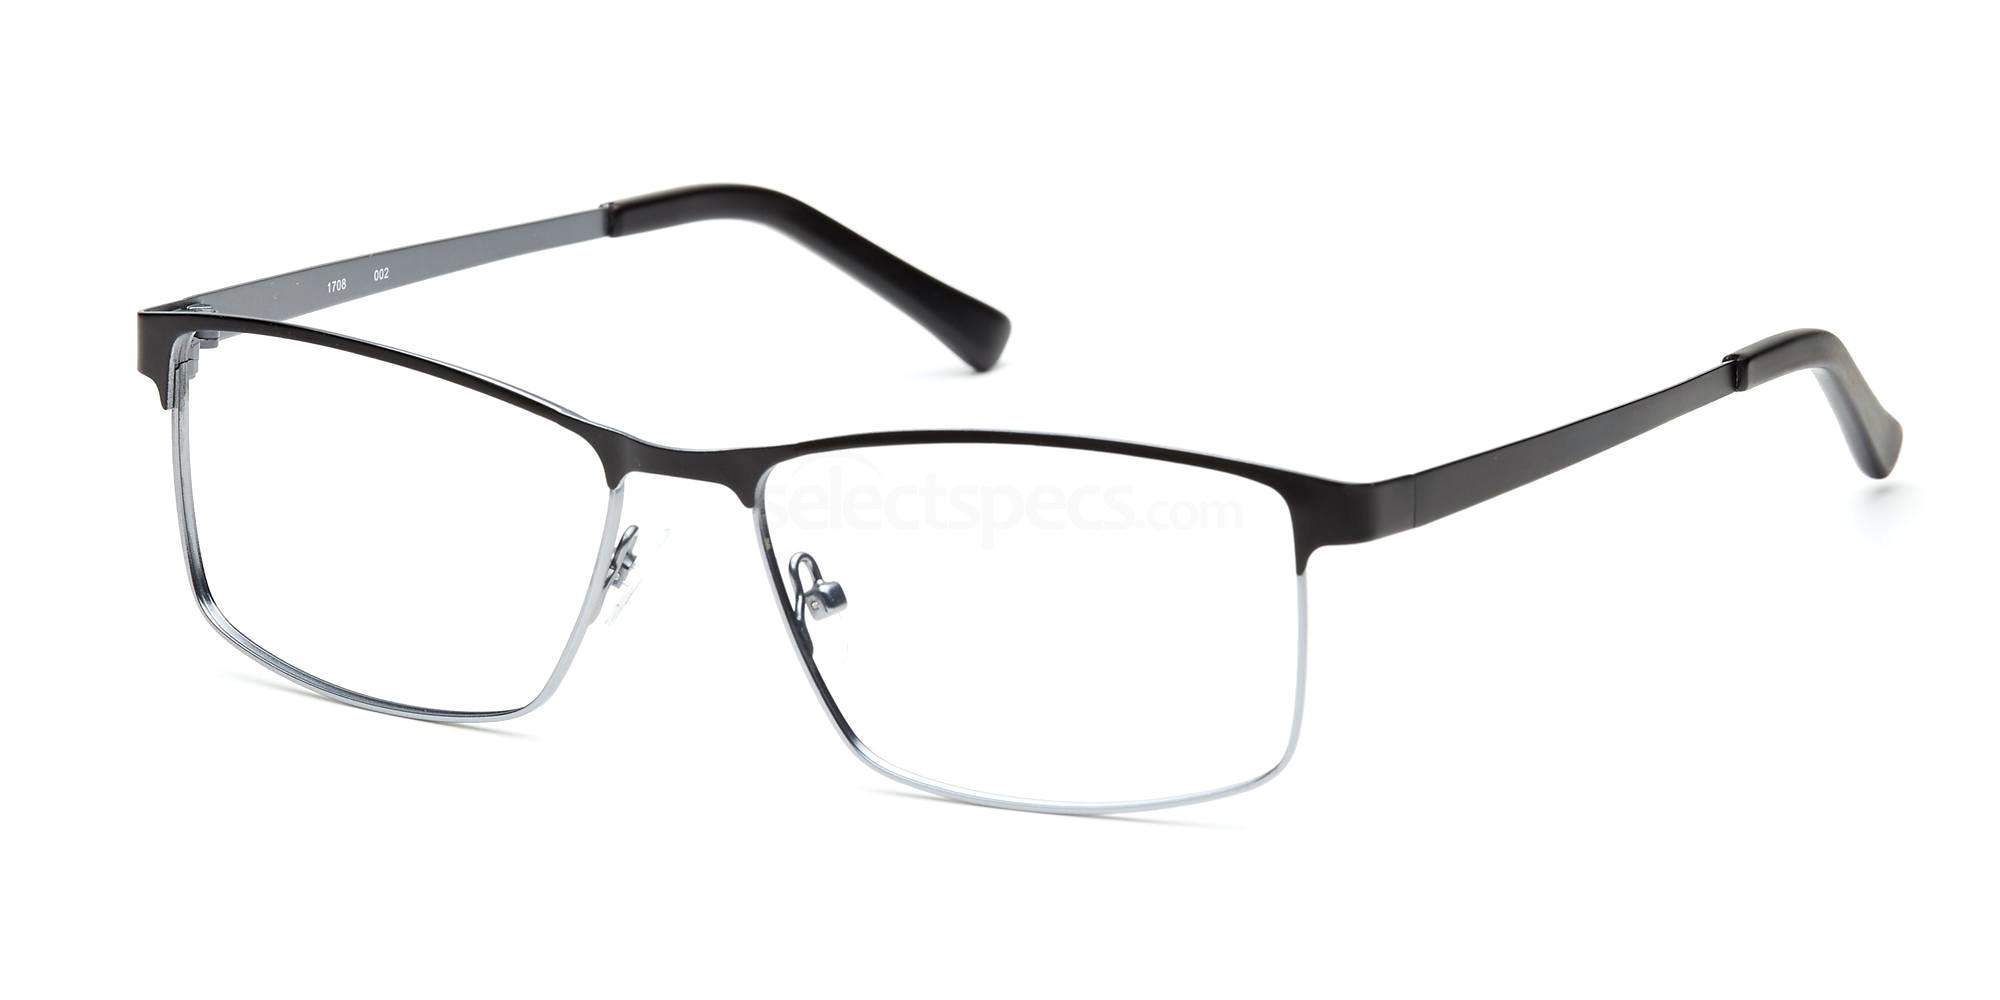 C1 FLX1708 Glasses, Flextra